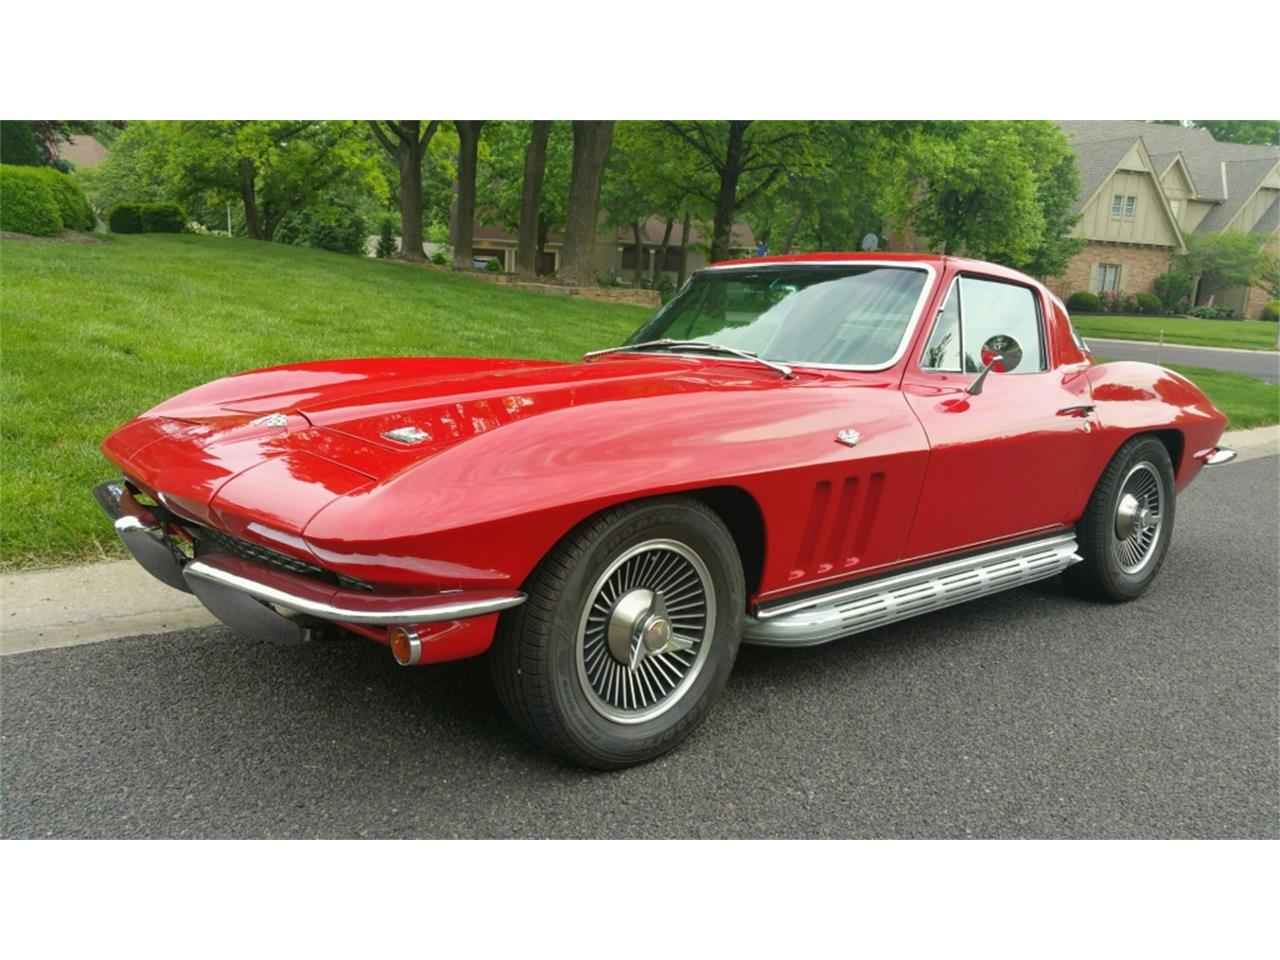 Large Picture of Classic '66 Chevrolet Corvette - $59,995.00 - MO25